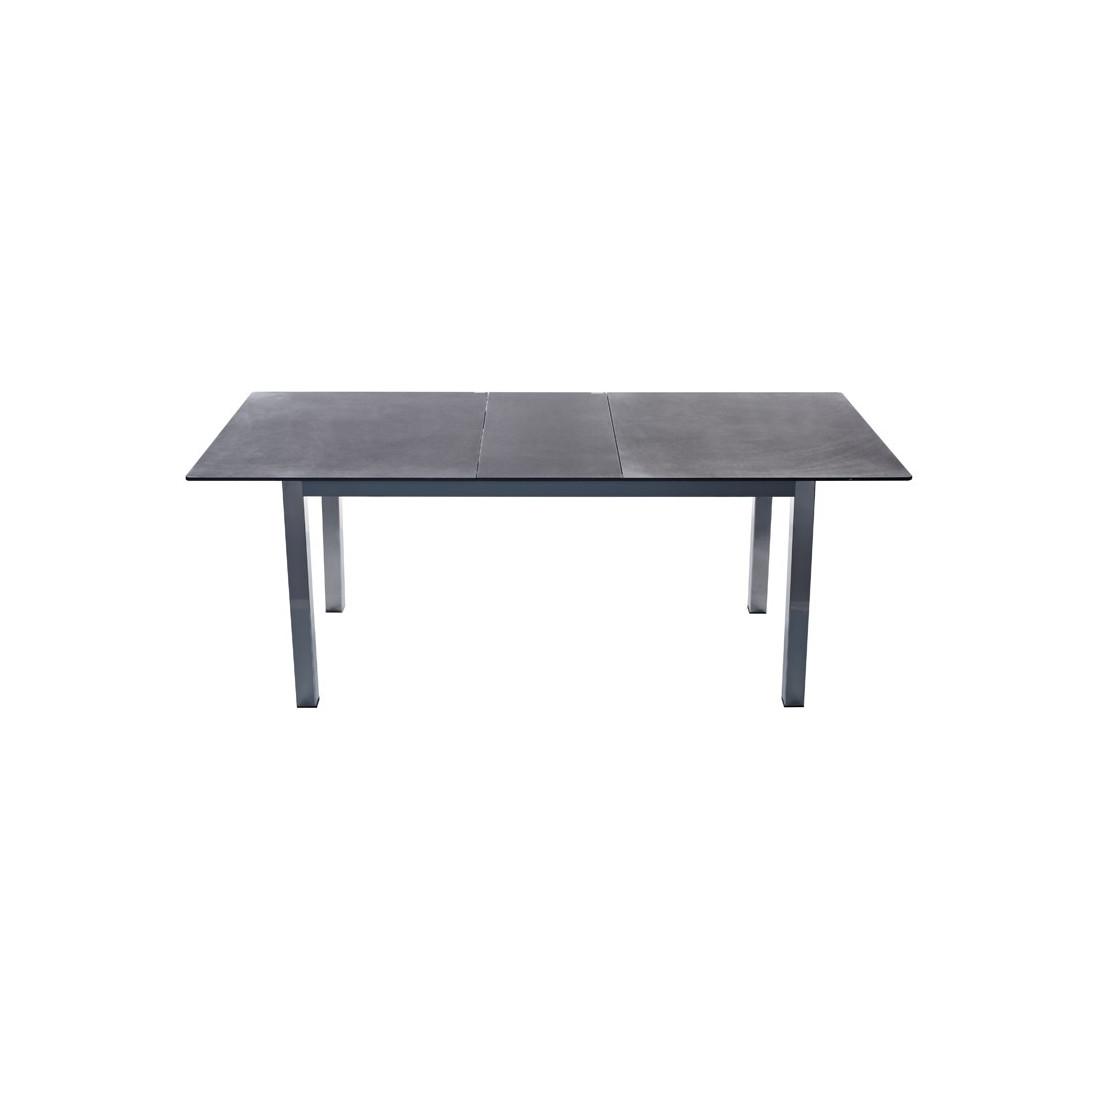 table de repas grany univers salle manger tousmesmeubles. Black Bedroom Furniture Sets. Home Design Ideas